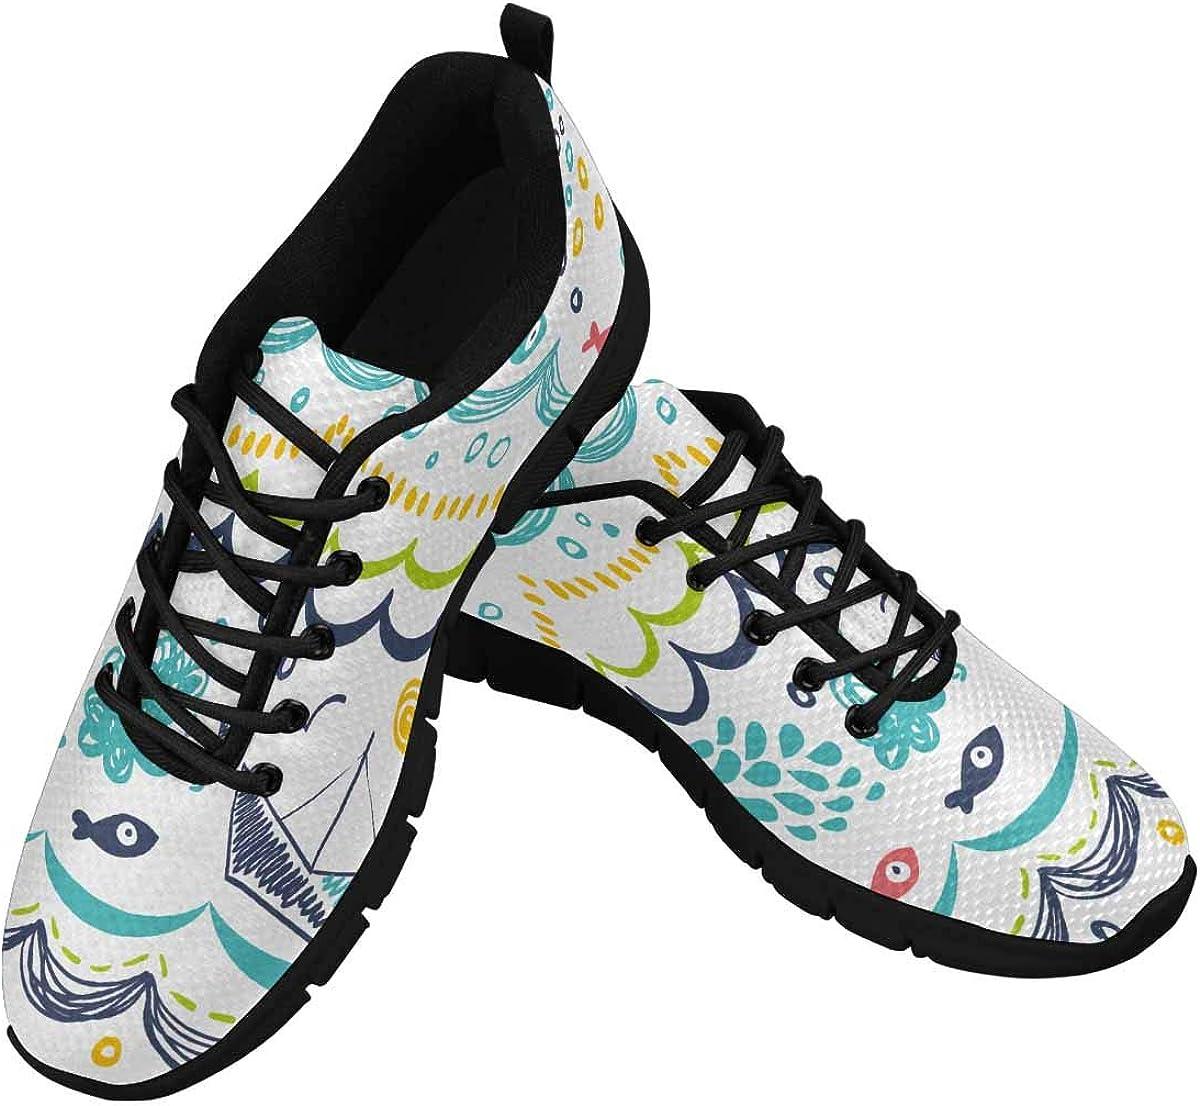 INTERESTPRINT Sea Ocean Wave Women Walking Shoes Comfortable Lightweight Work Casual Travel Sneakers